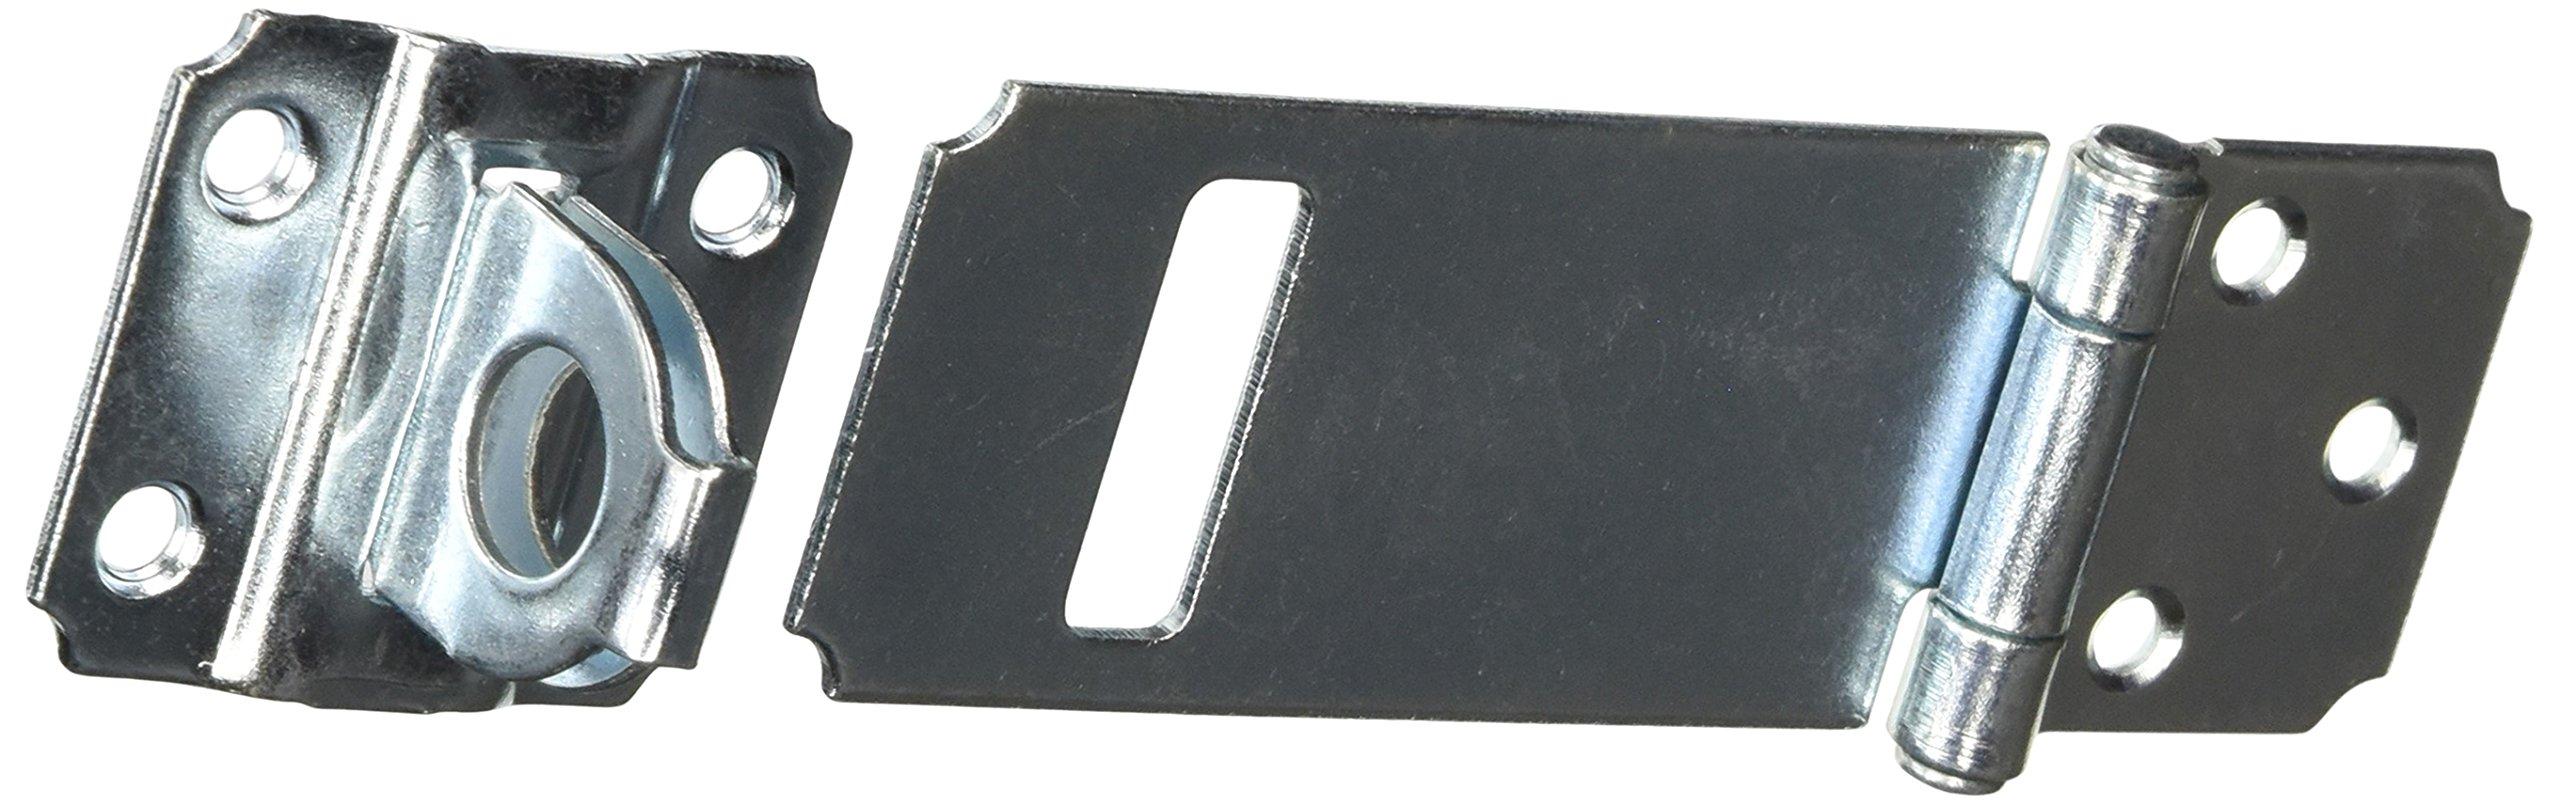 MINTCRAFT LR-123-BC3L Adjustable Staple Safety Hasp, Zinc, 3-1/2-Inch